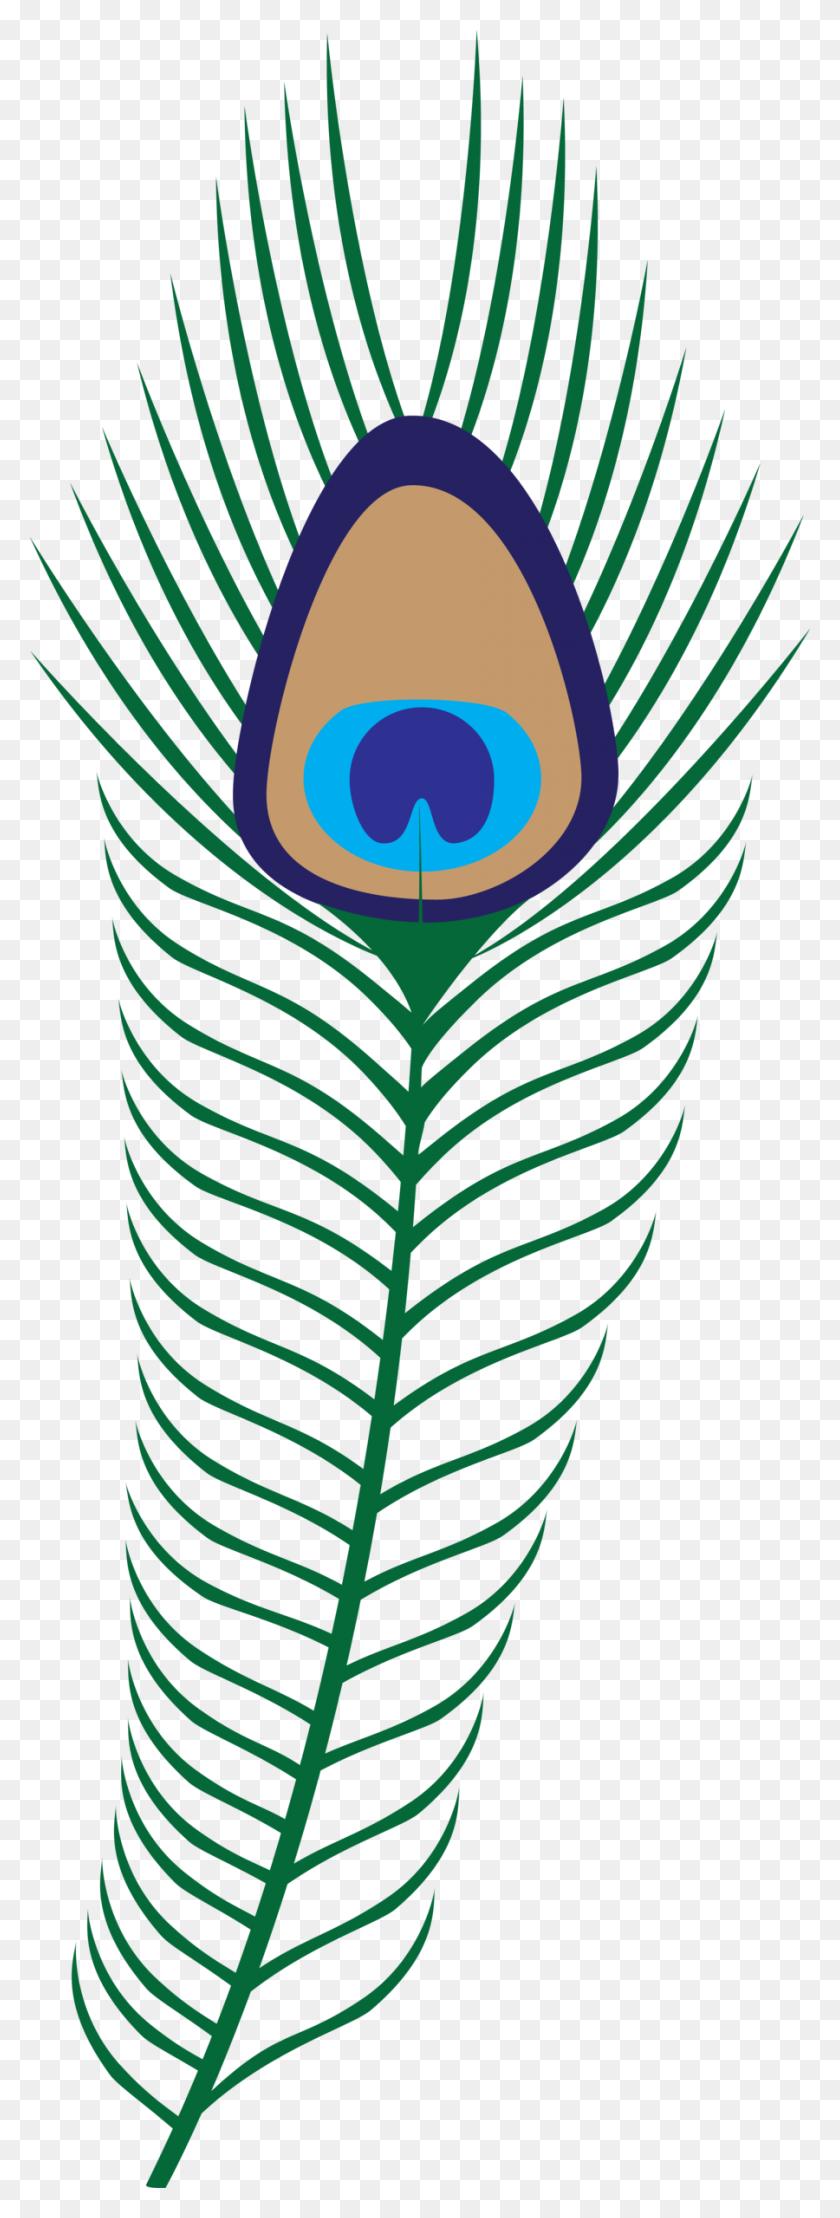 Krishna Clipart Peacock Feather - Batman Clipart Black And White